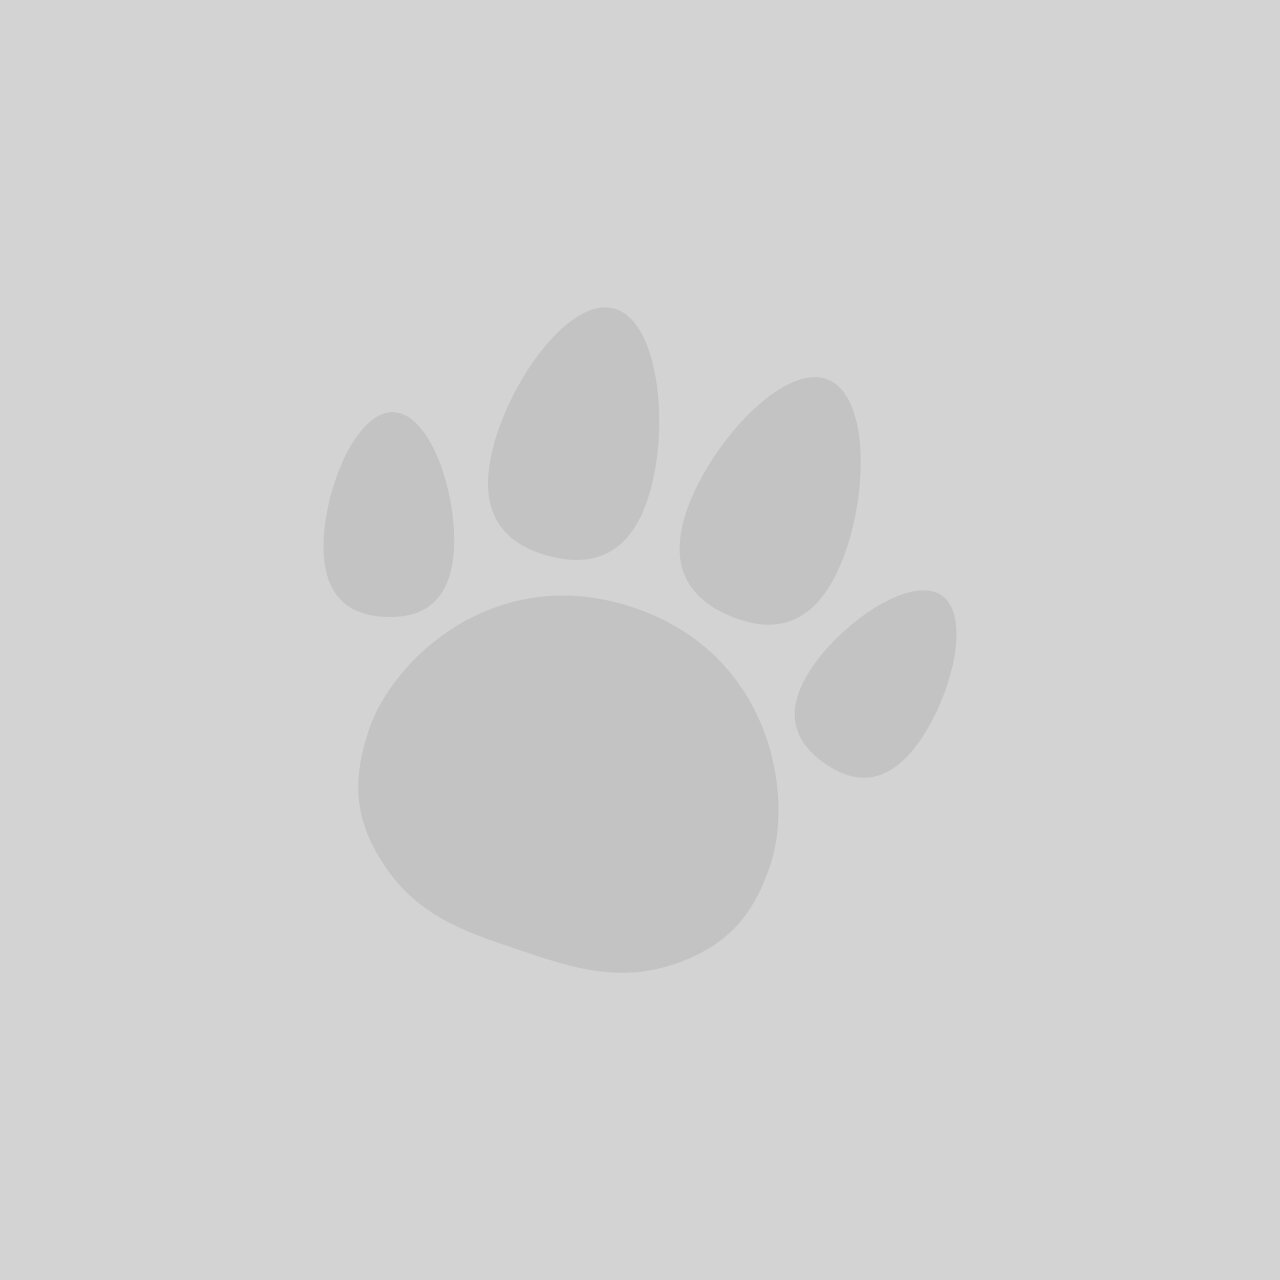 Flexi Classic Retractable Tape Large Dog Lead 5m - Blue